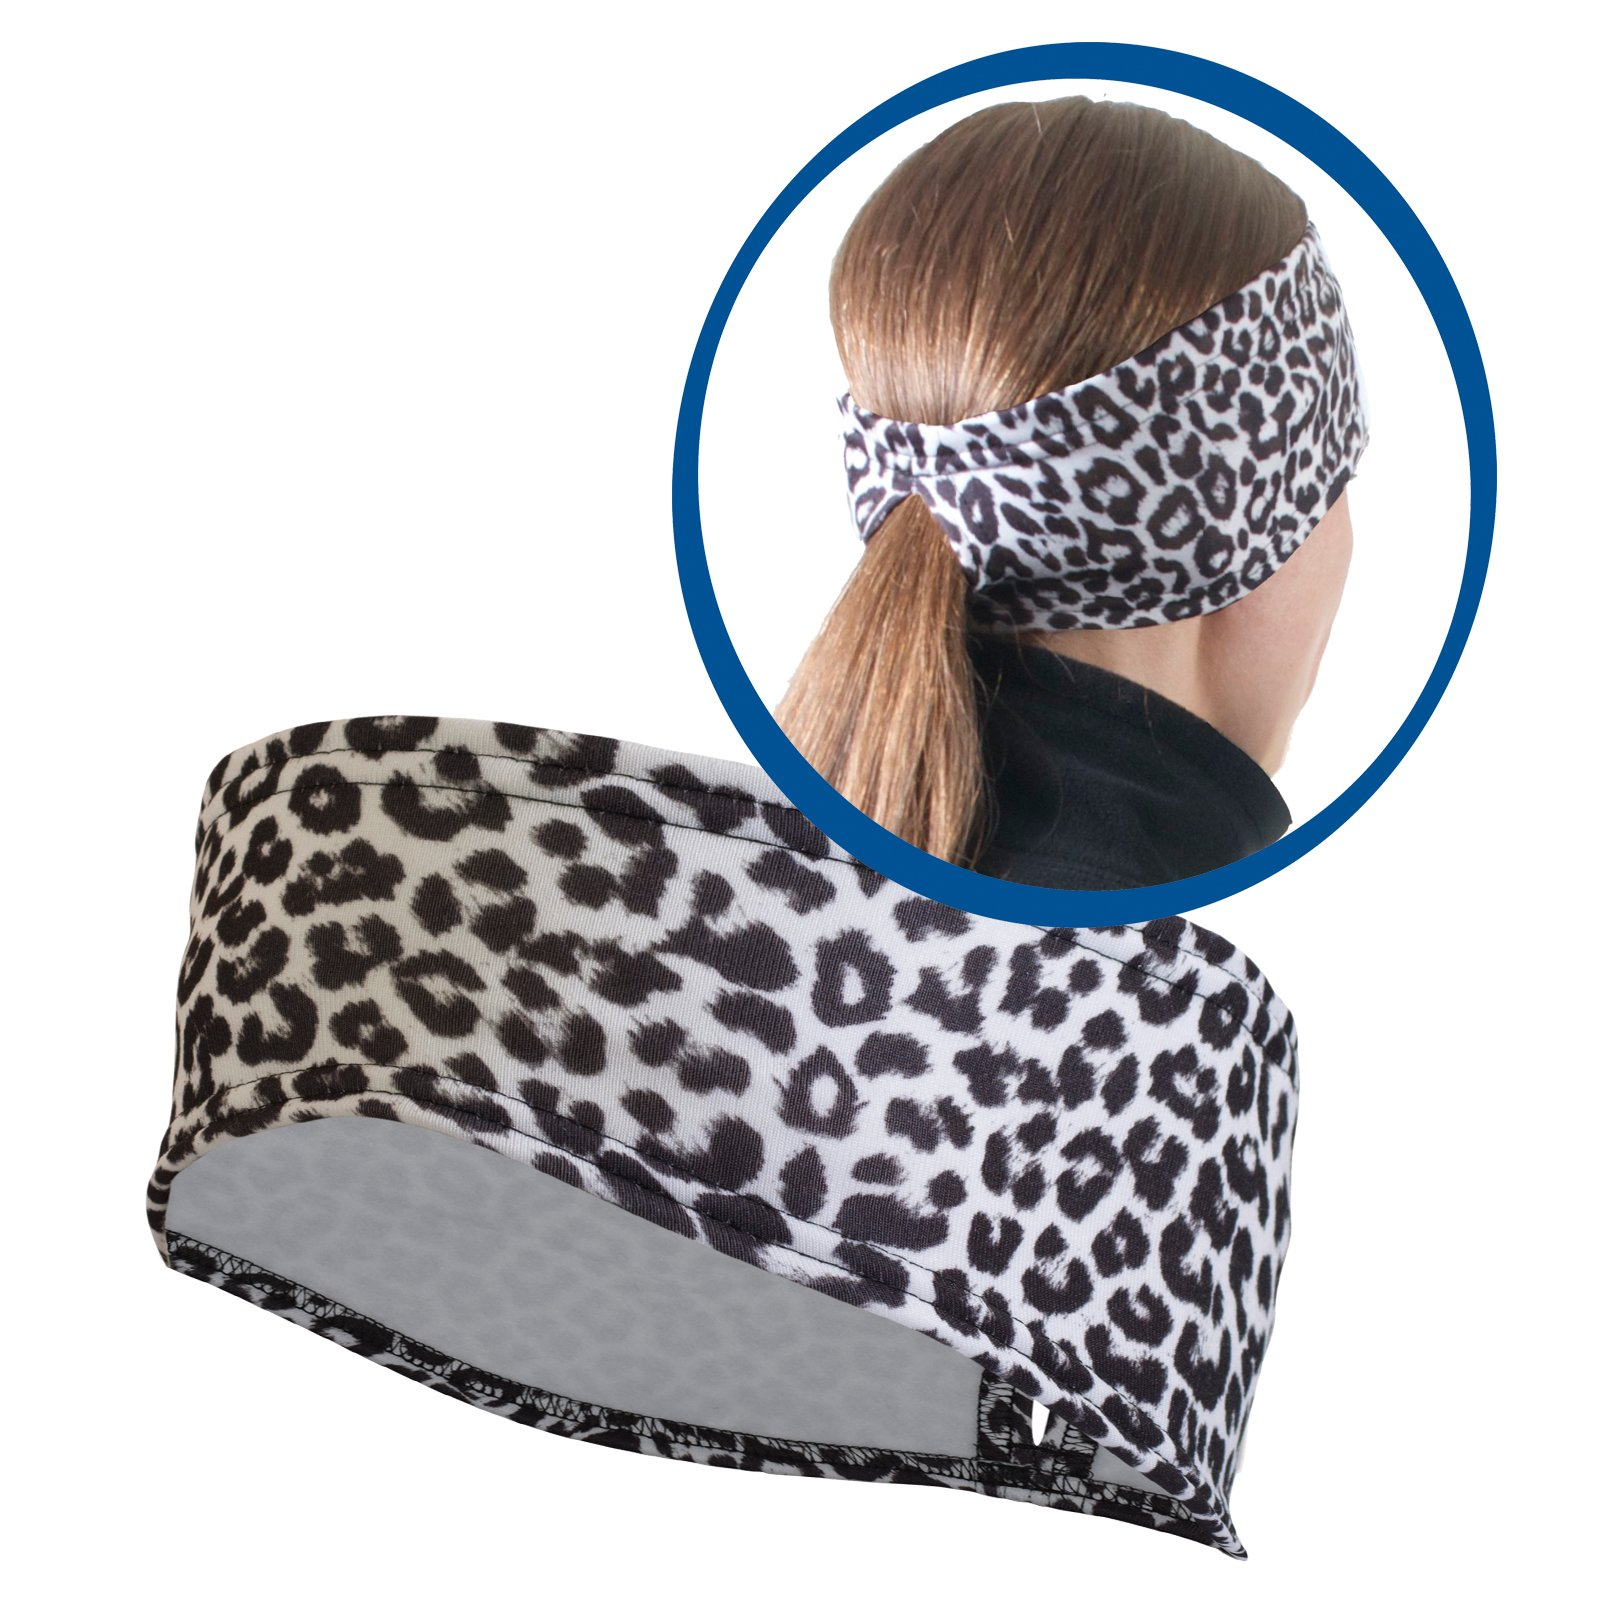 TrailHeads Women's Print Ponytail Headband – 12 prints - Made in USA - snow leopard